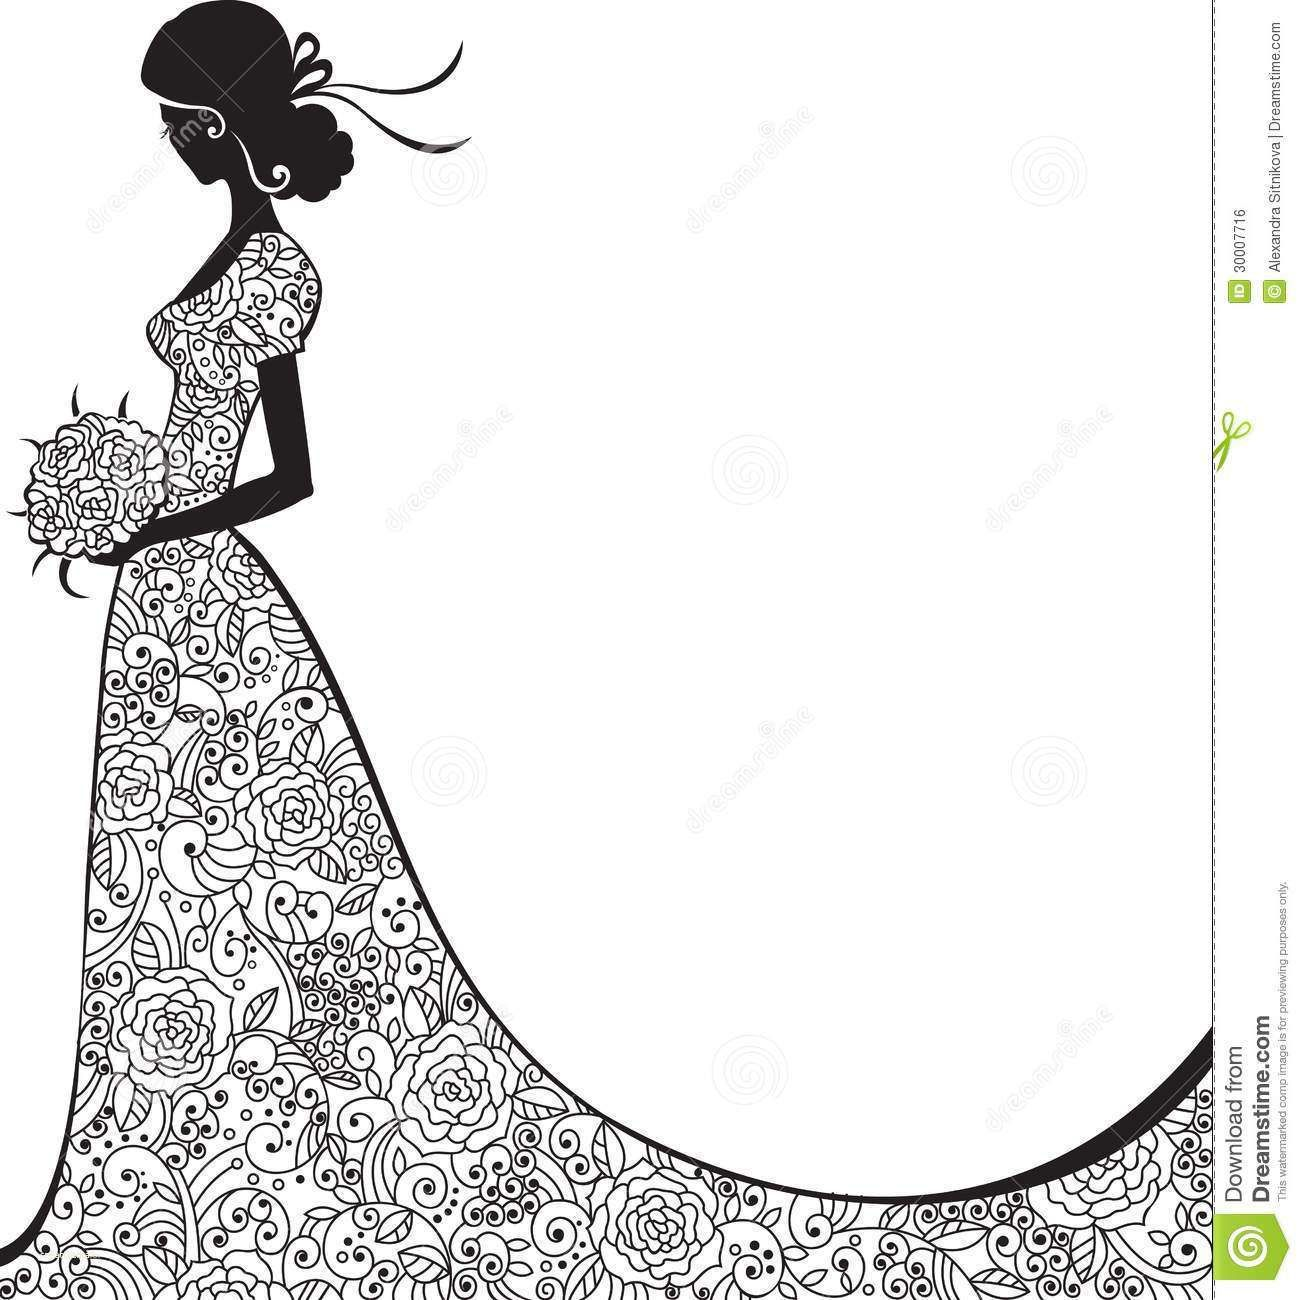 hight resolution of modern wedding clipart awesome modern wedding clipart 13 modern bridal bits baubles hey eep